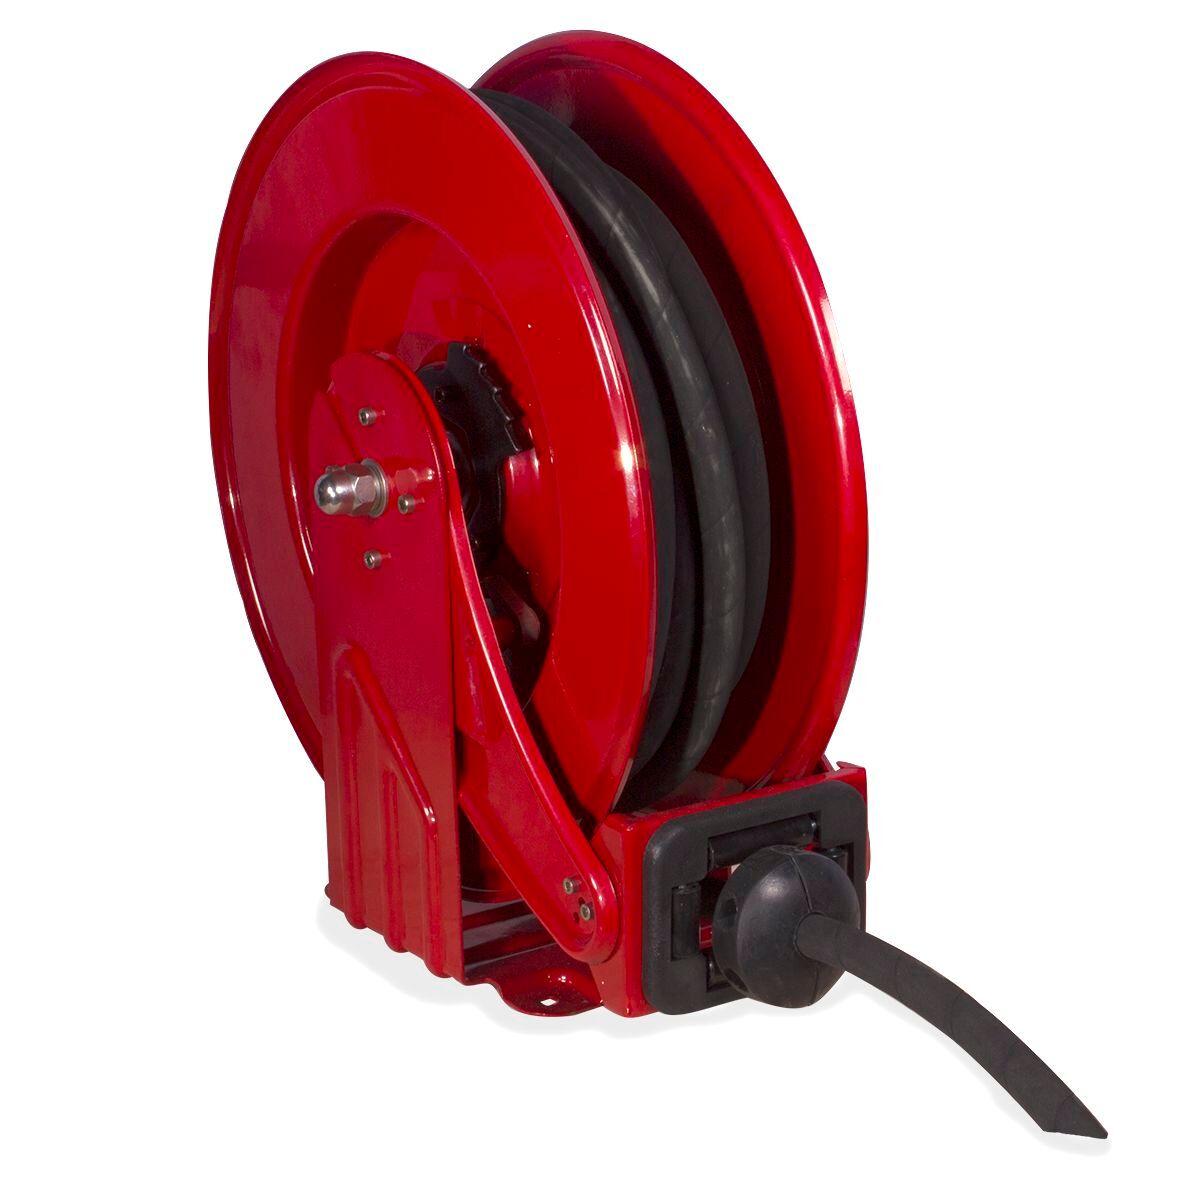 Mw-tools Enrouleur huile 10 m - 1/2 MW-Tools SHO1210